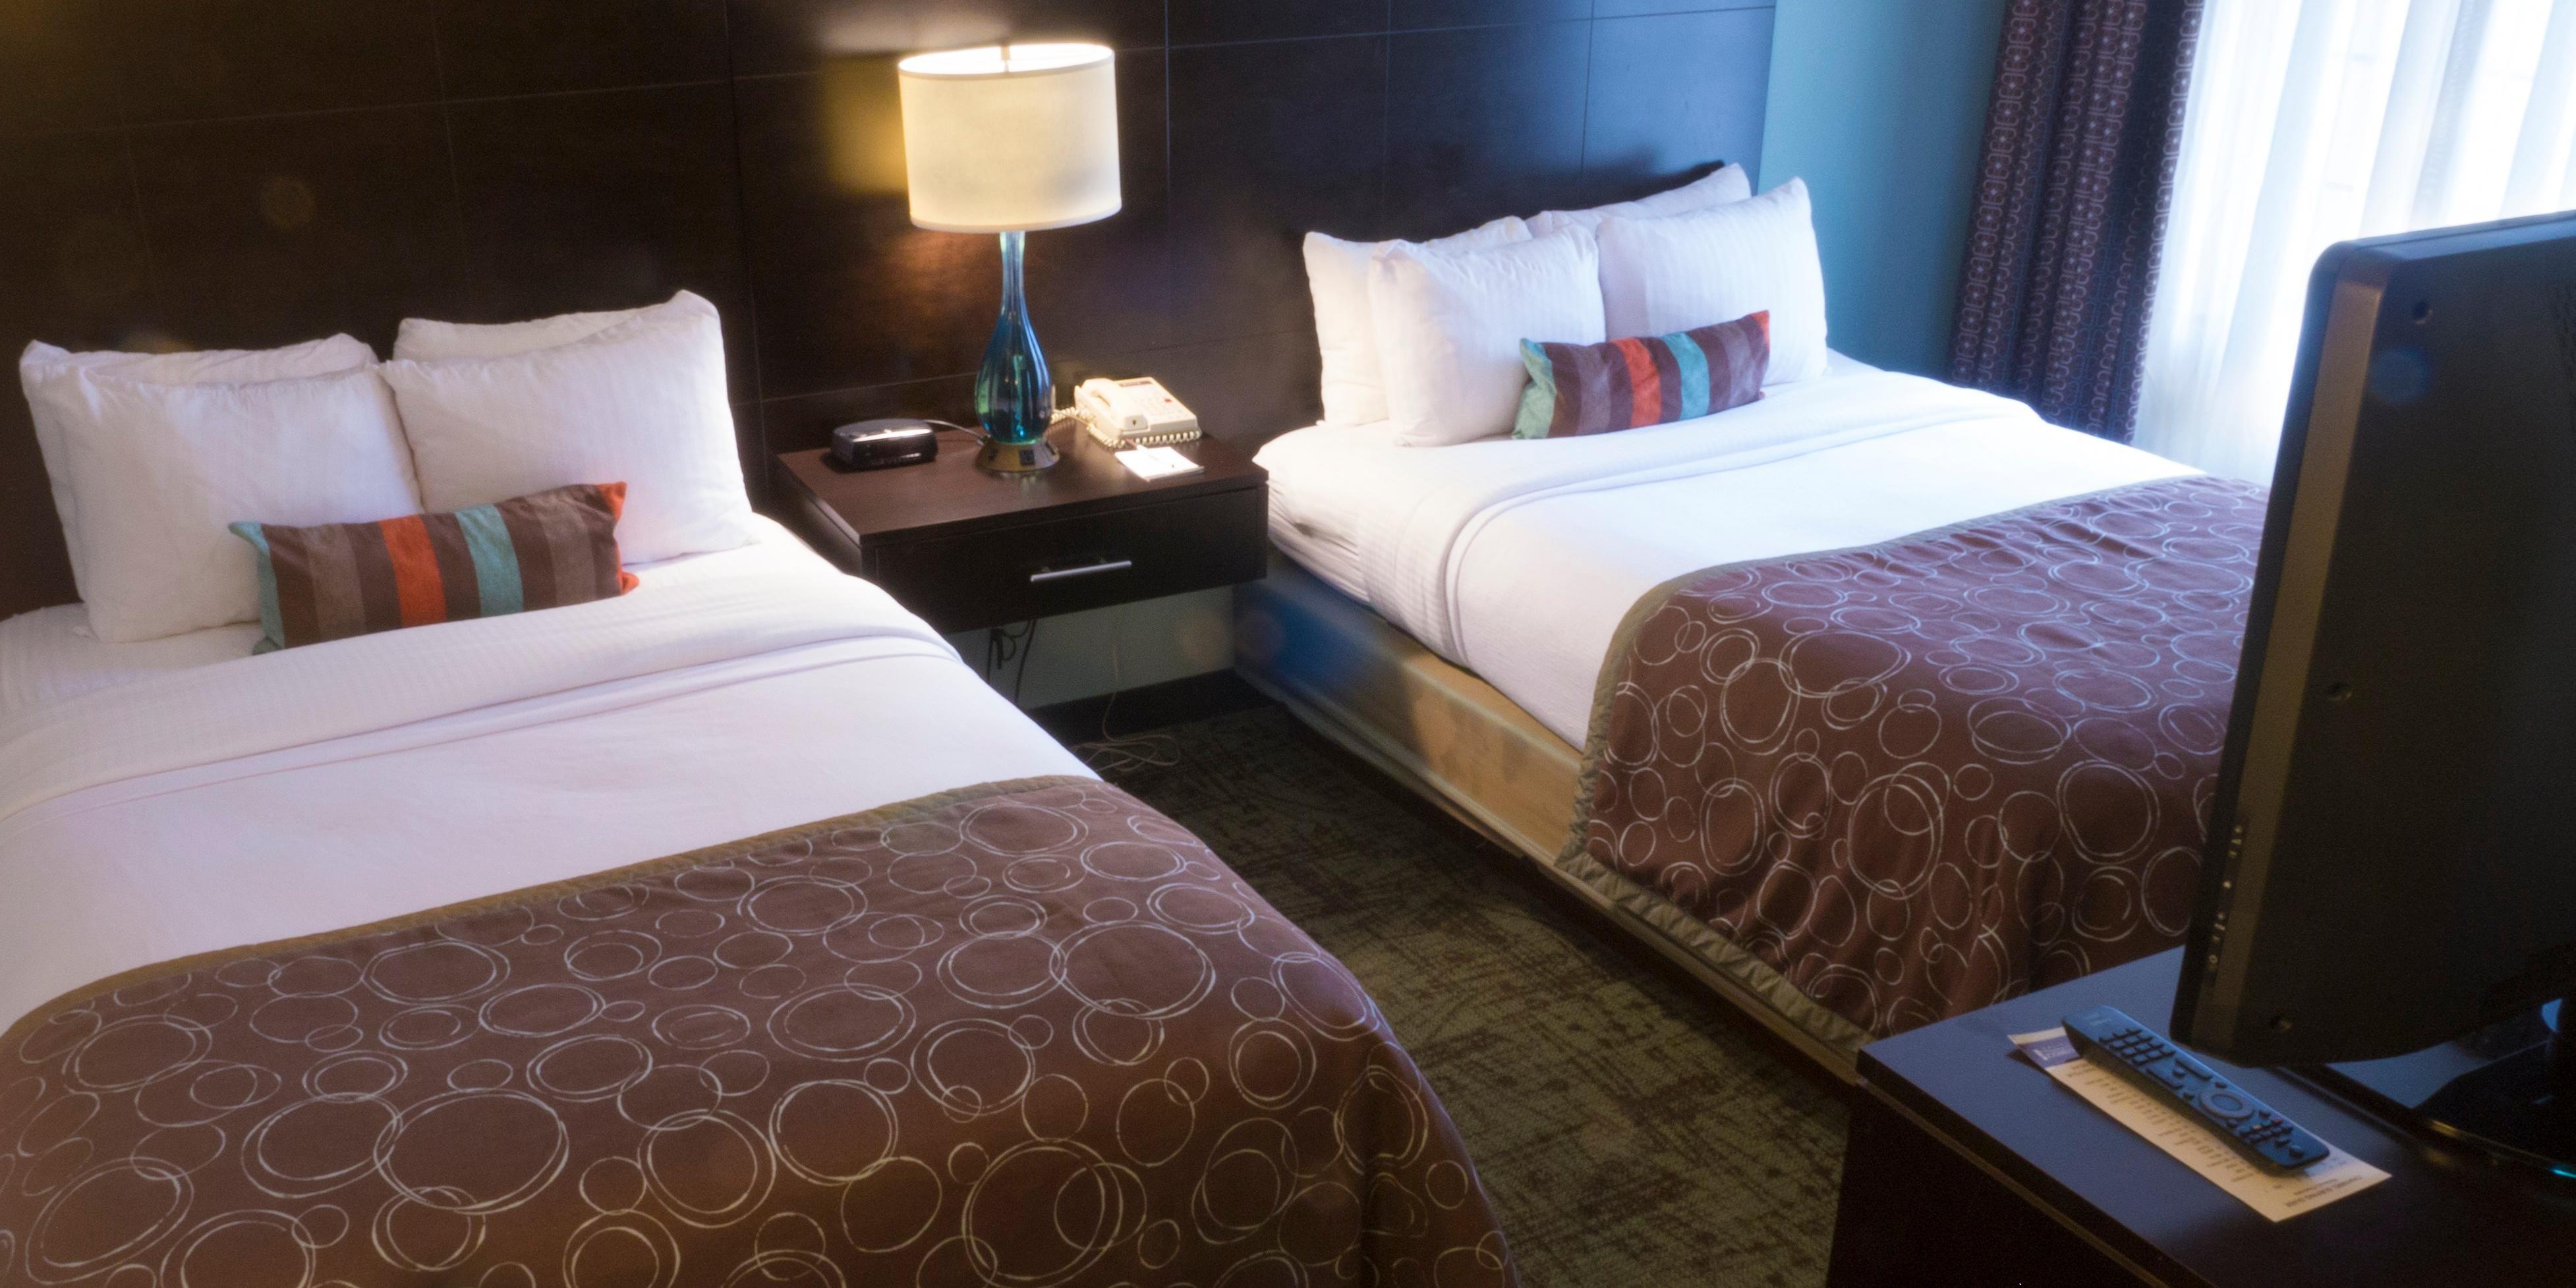 2 Bedroom Hotels Columbus Oh Blogsworkanywarecouk